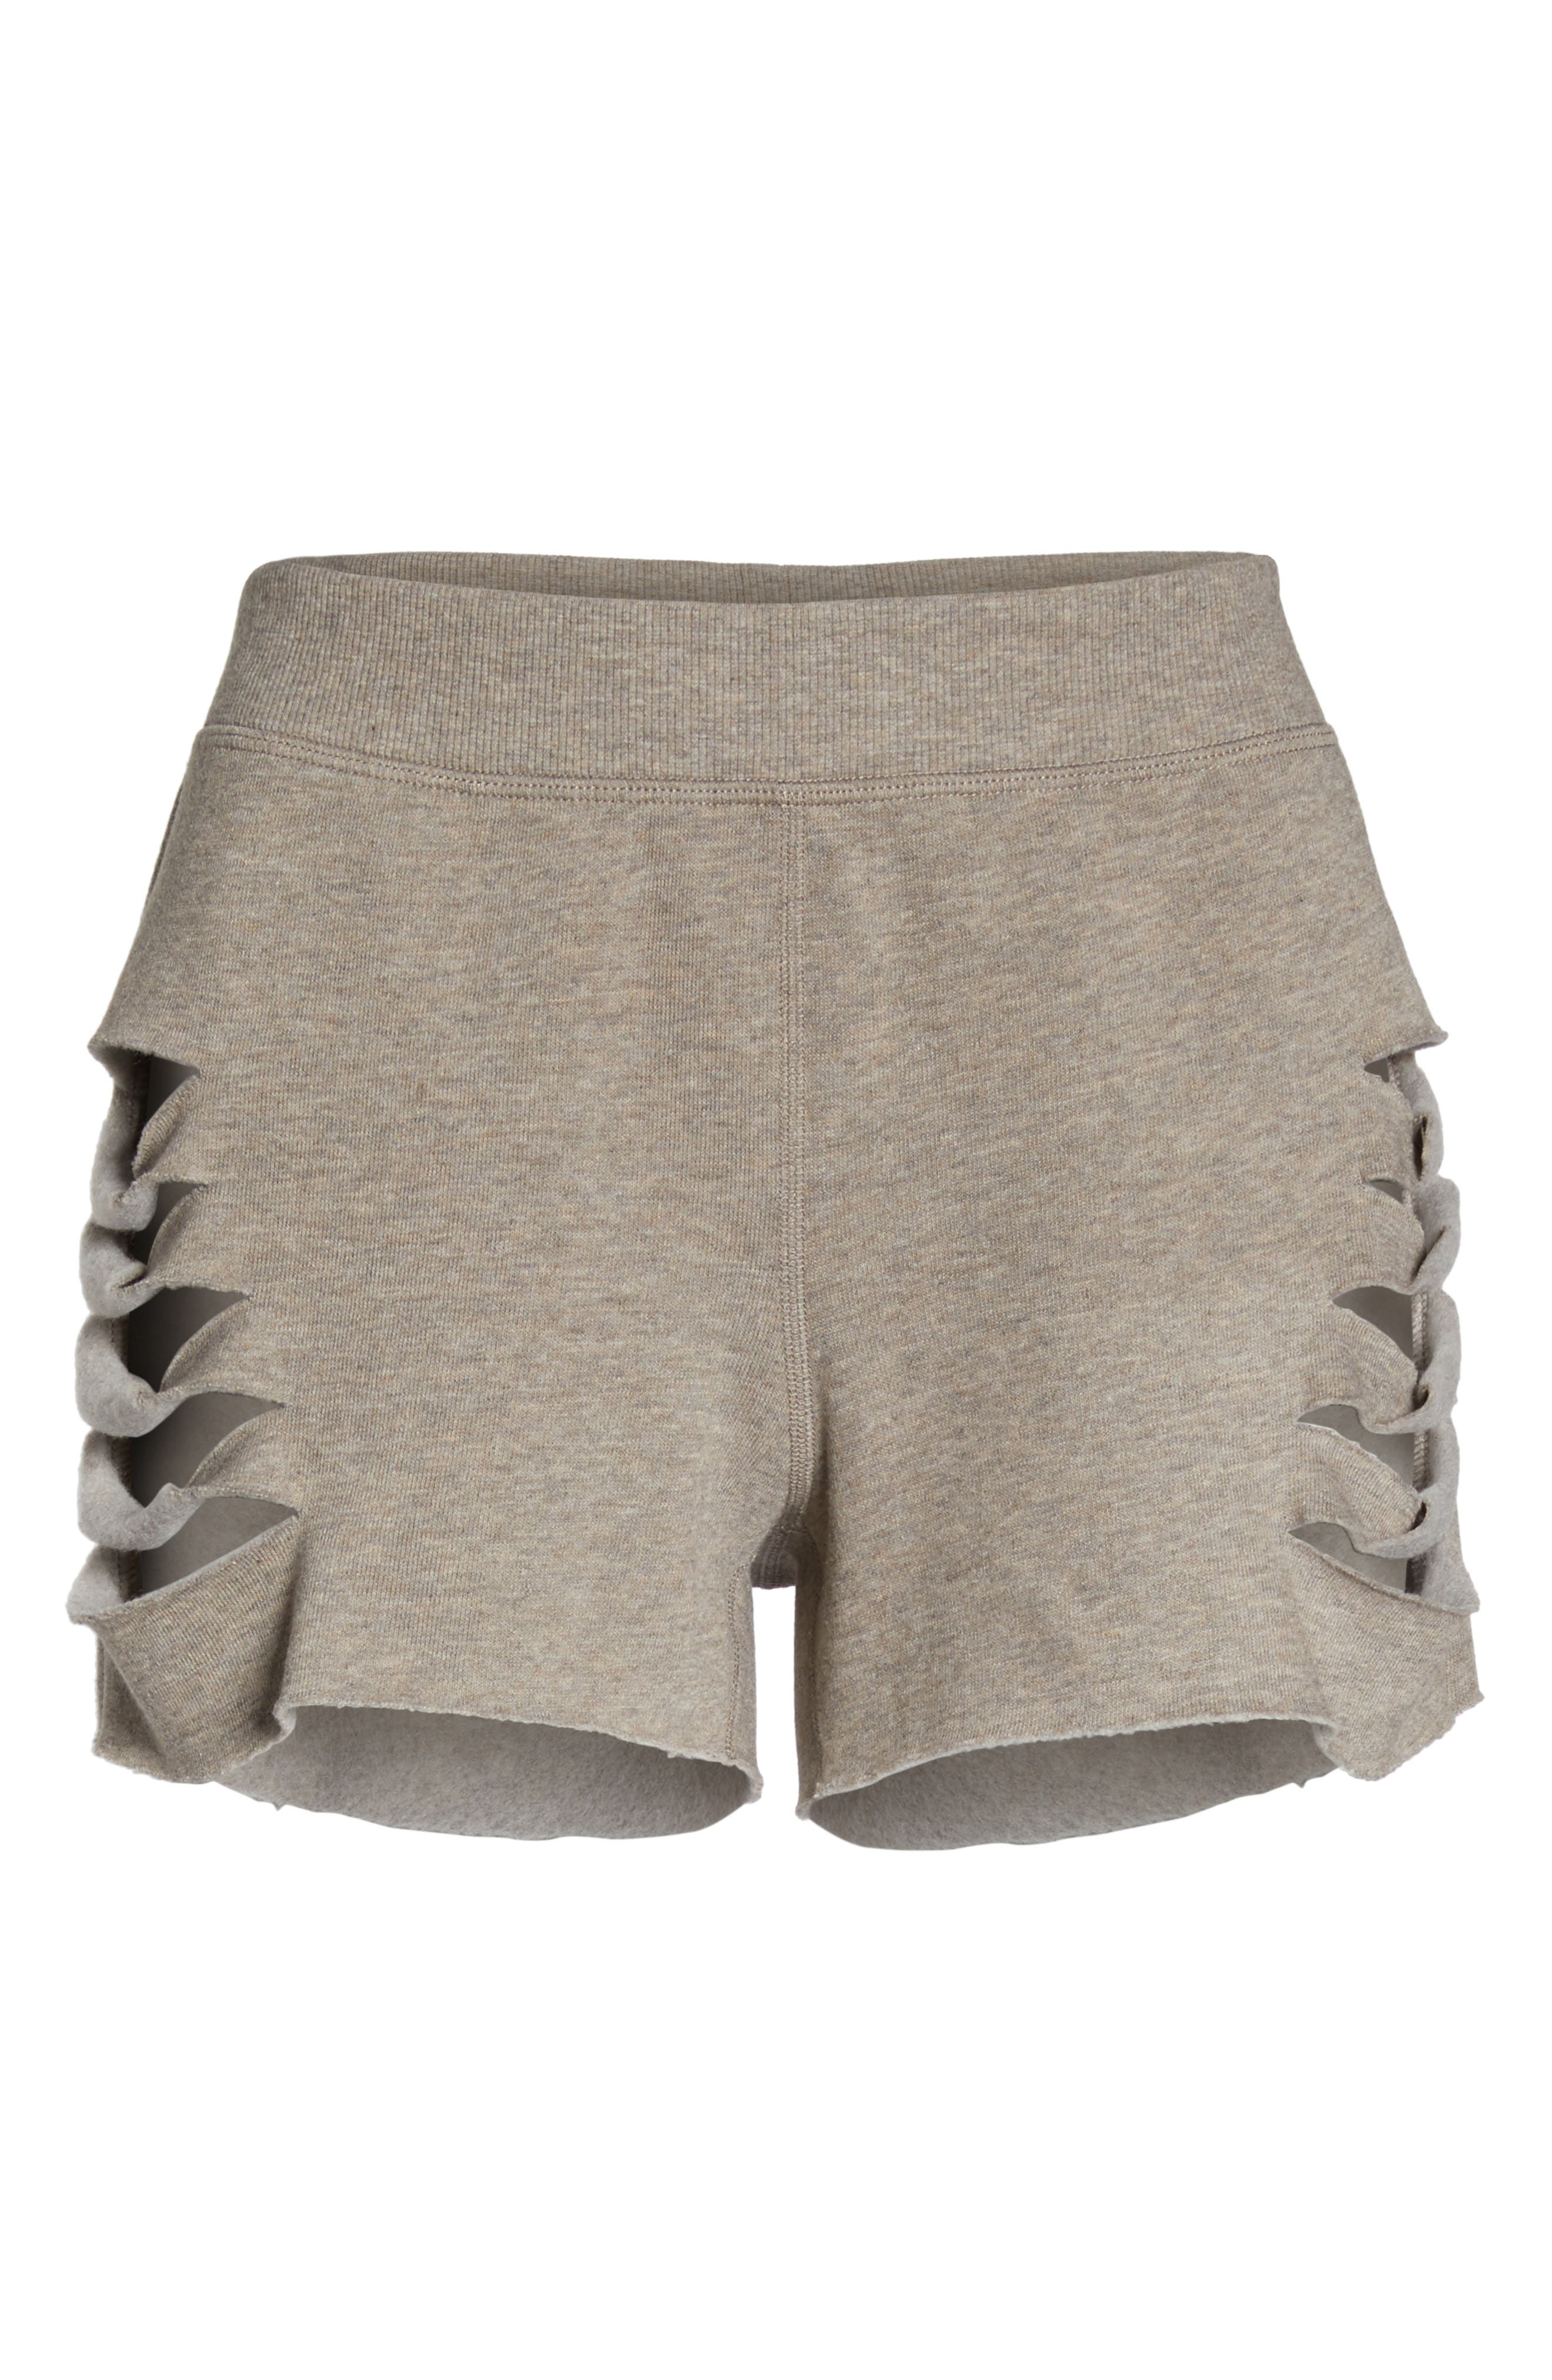 Slay Shorts,                             Alternate thumbnail 13, color,